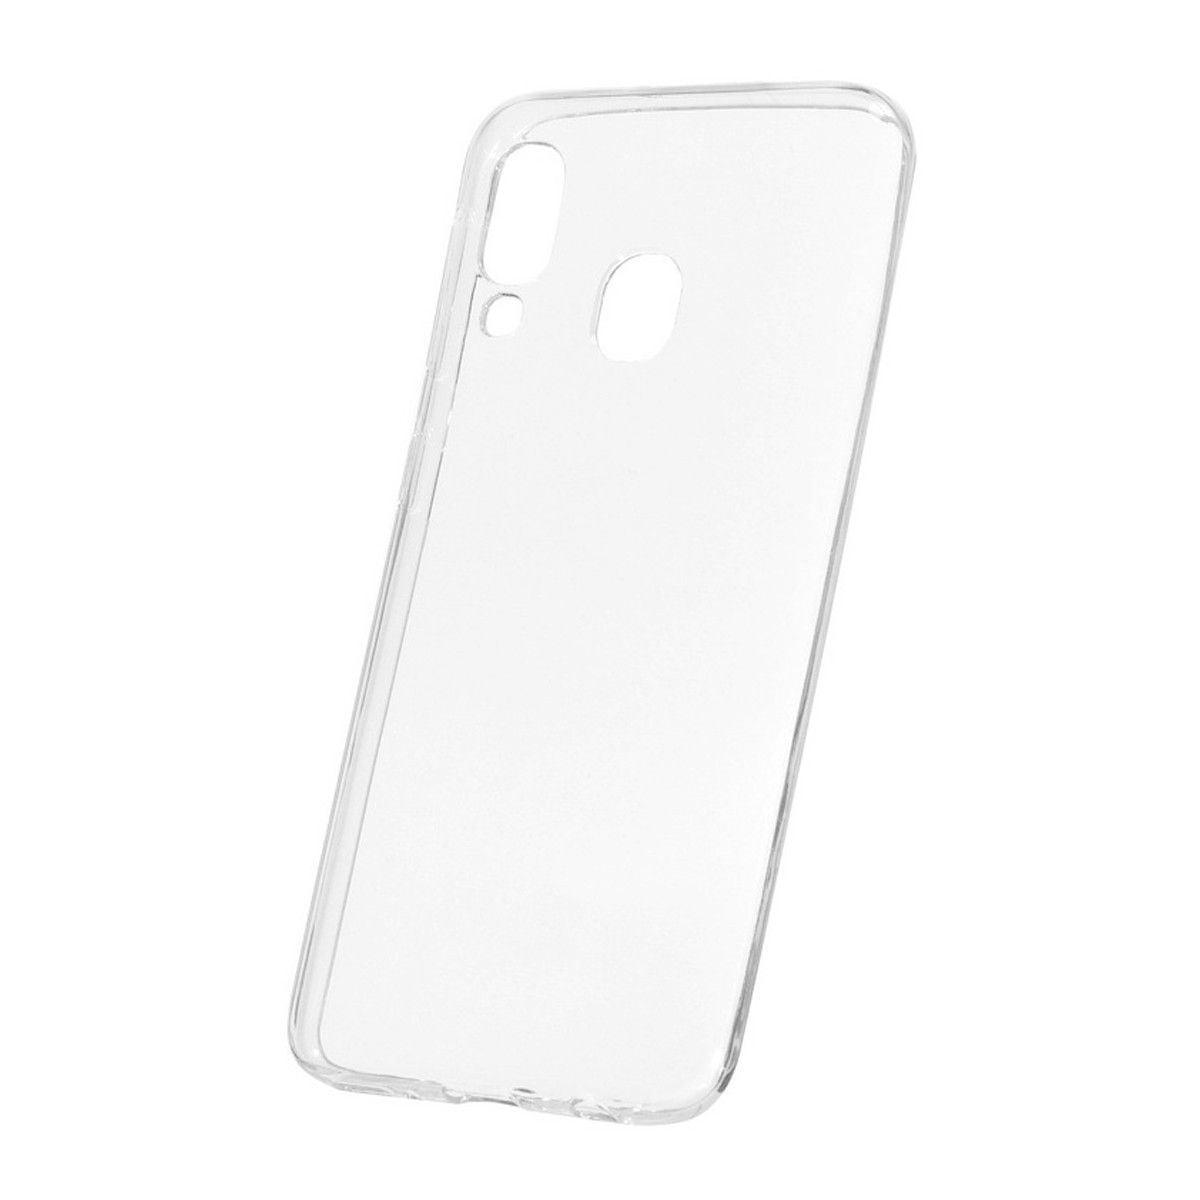 Husa silicon pentru Samsung Galaxy M30/ A40S, Clear Case, Transparent